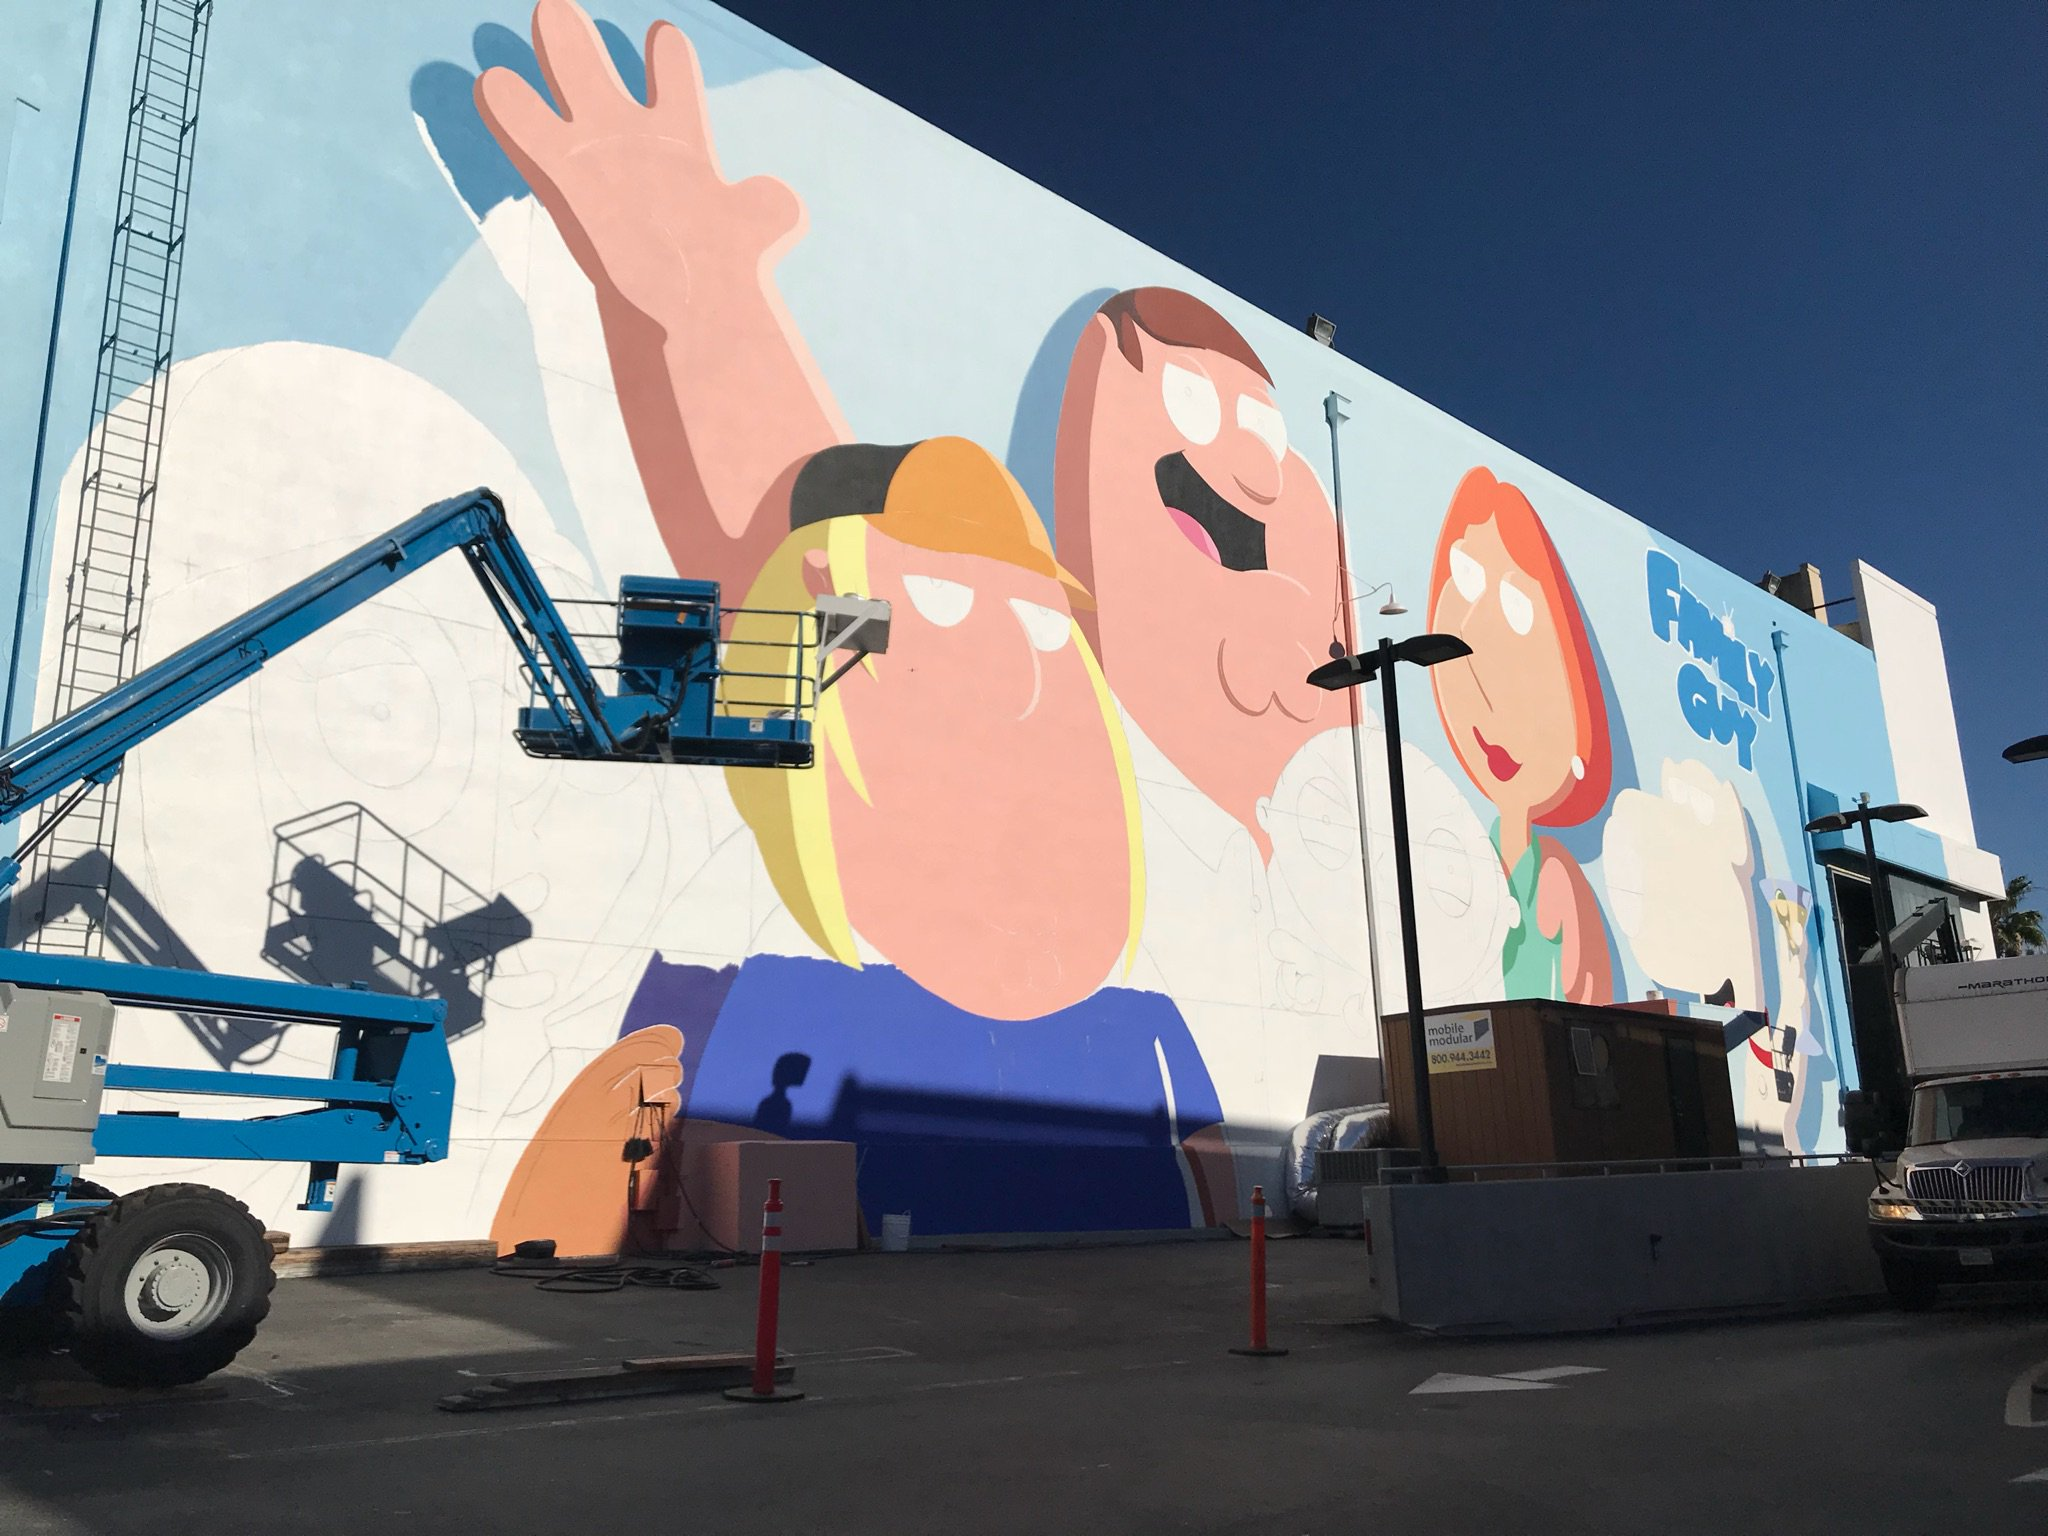 Finally gettin our mural on the Fox lot https://t.co/qQVaiurjpK